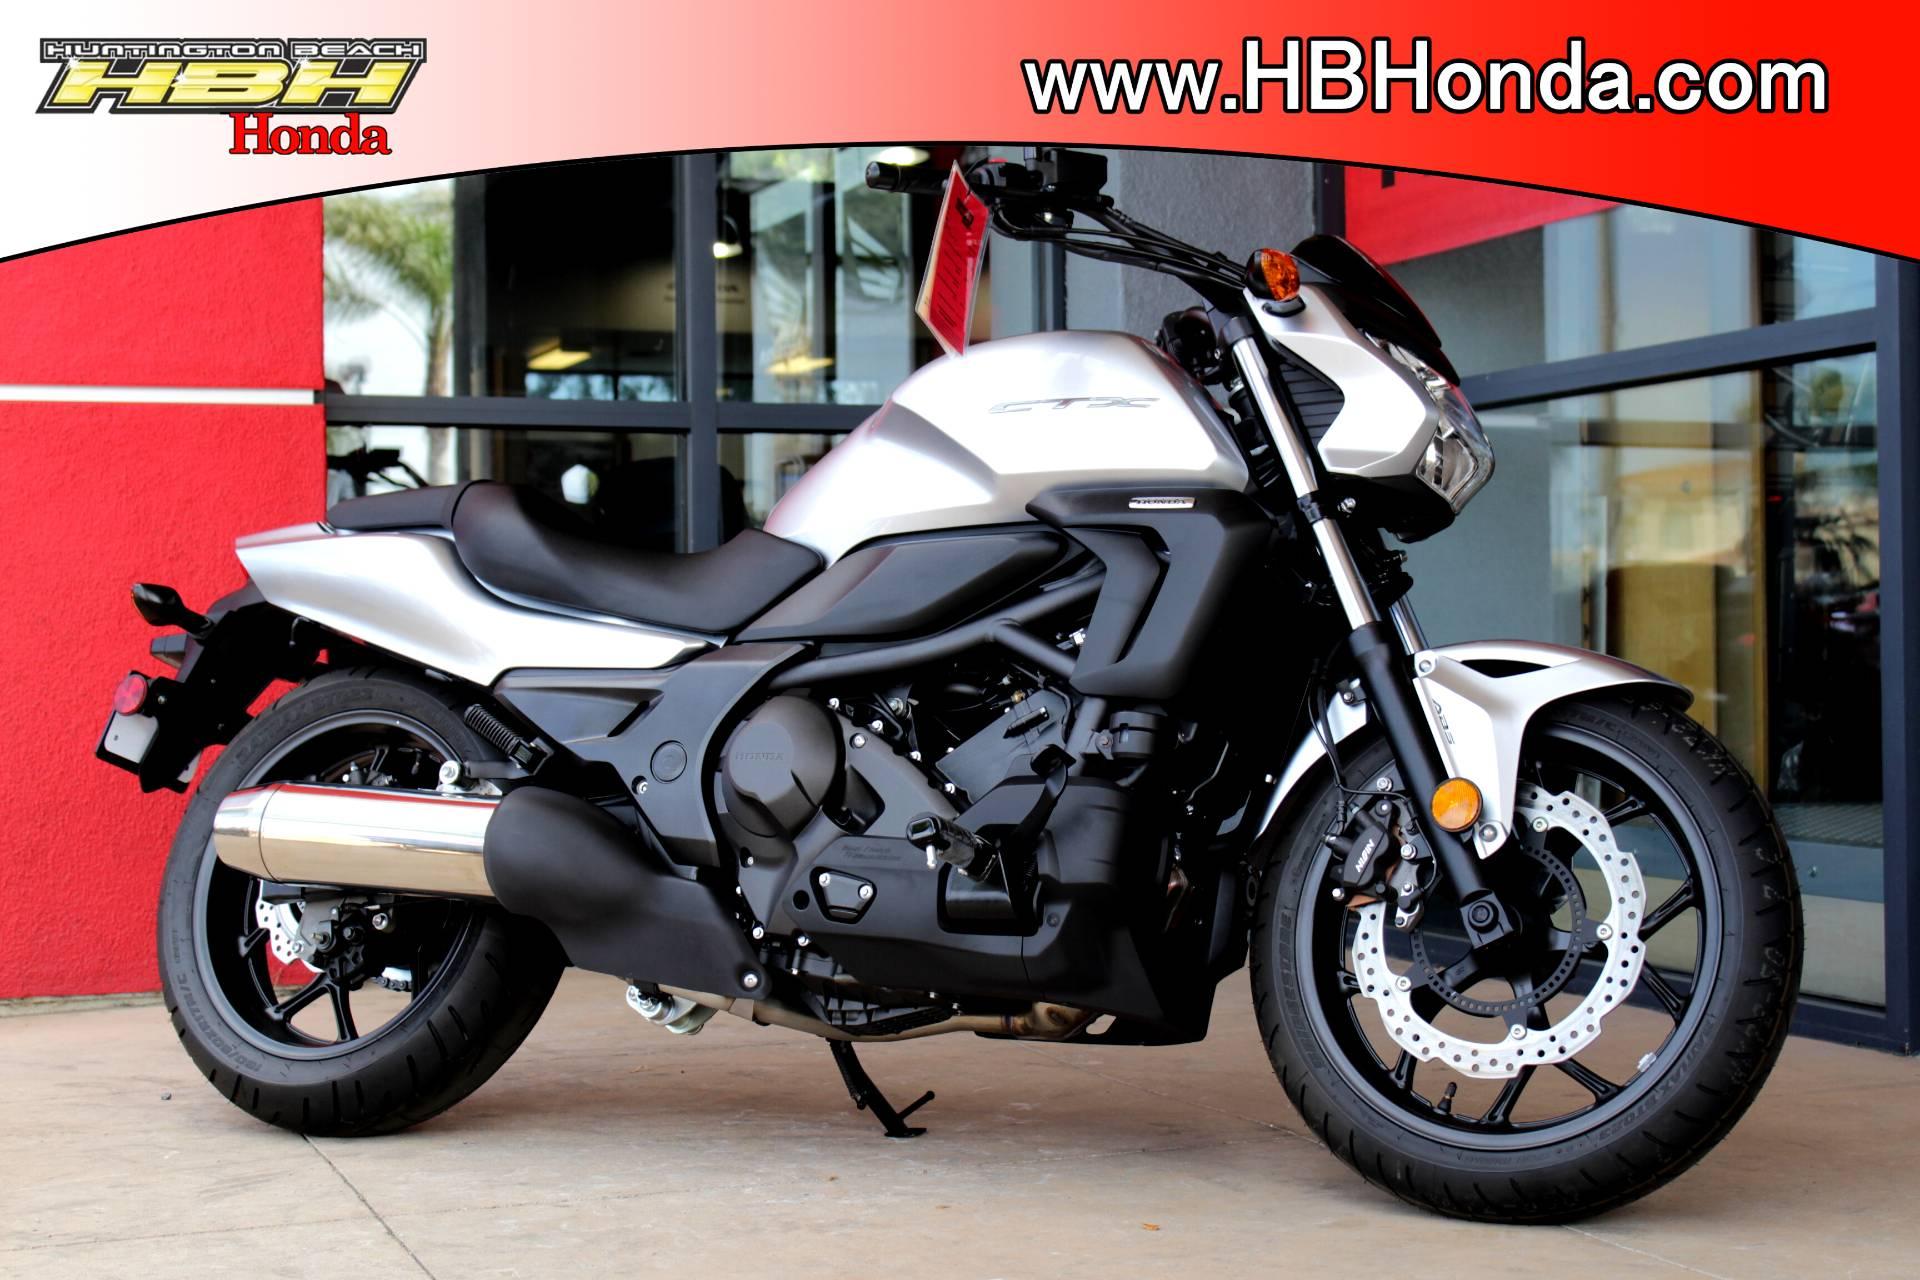 new 2015 honda ctx®700n dct abs motorcycles in huntington beach